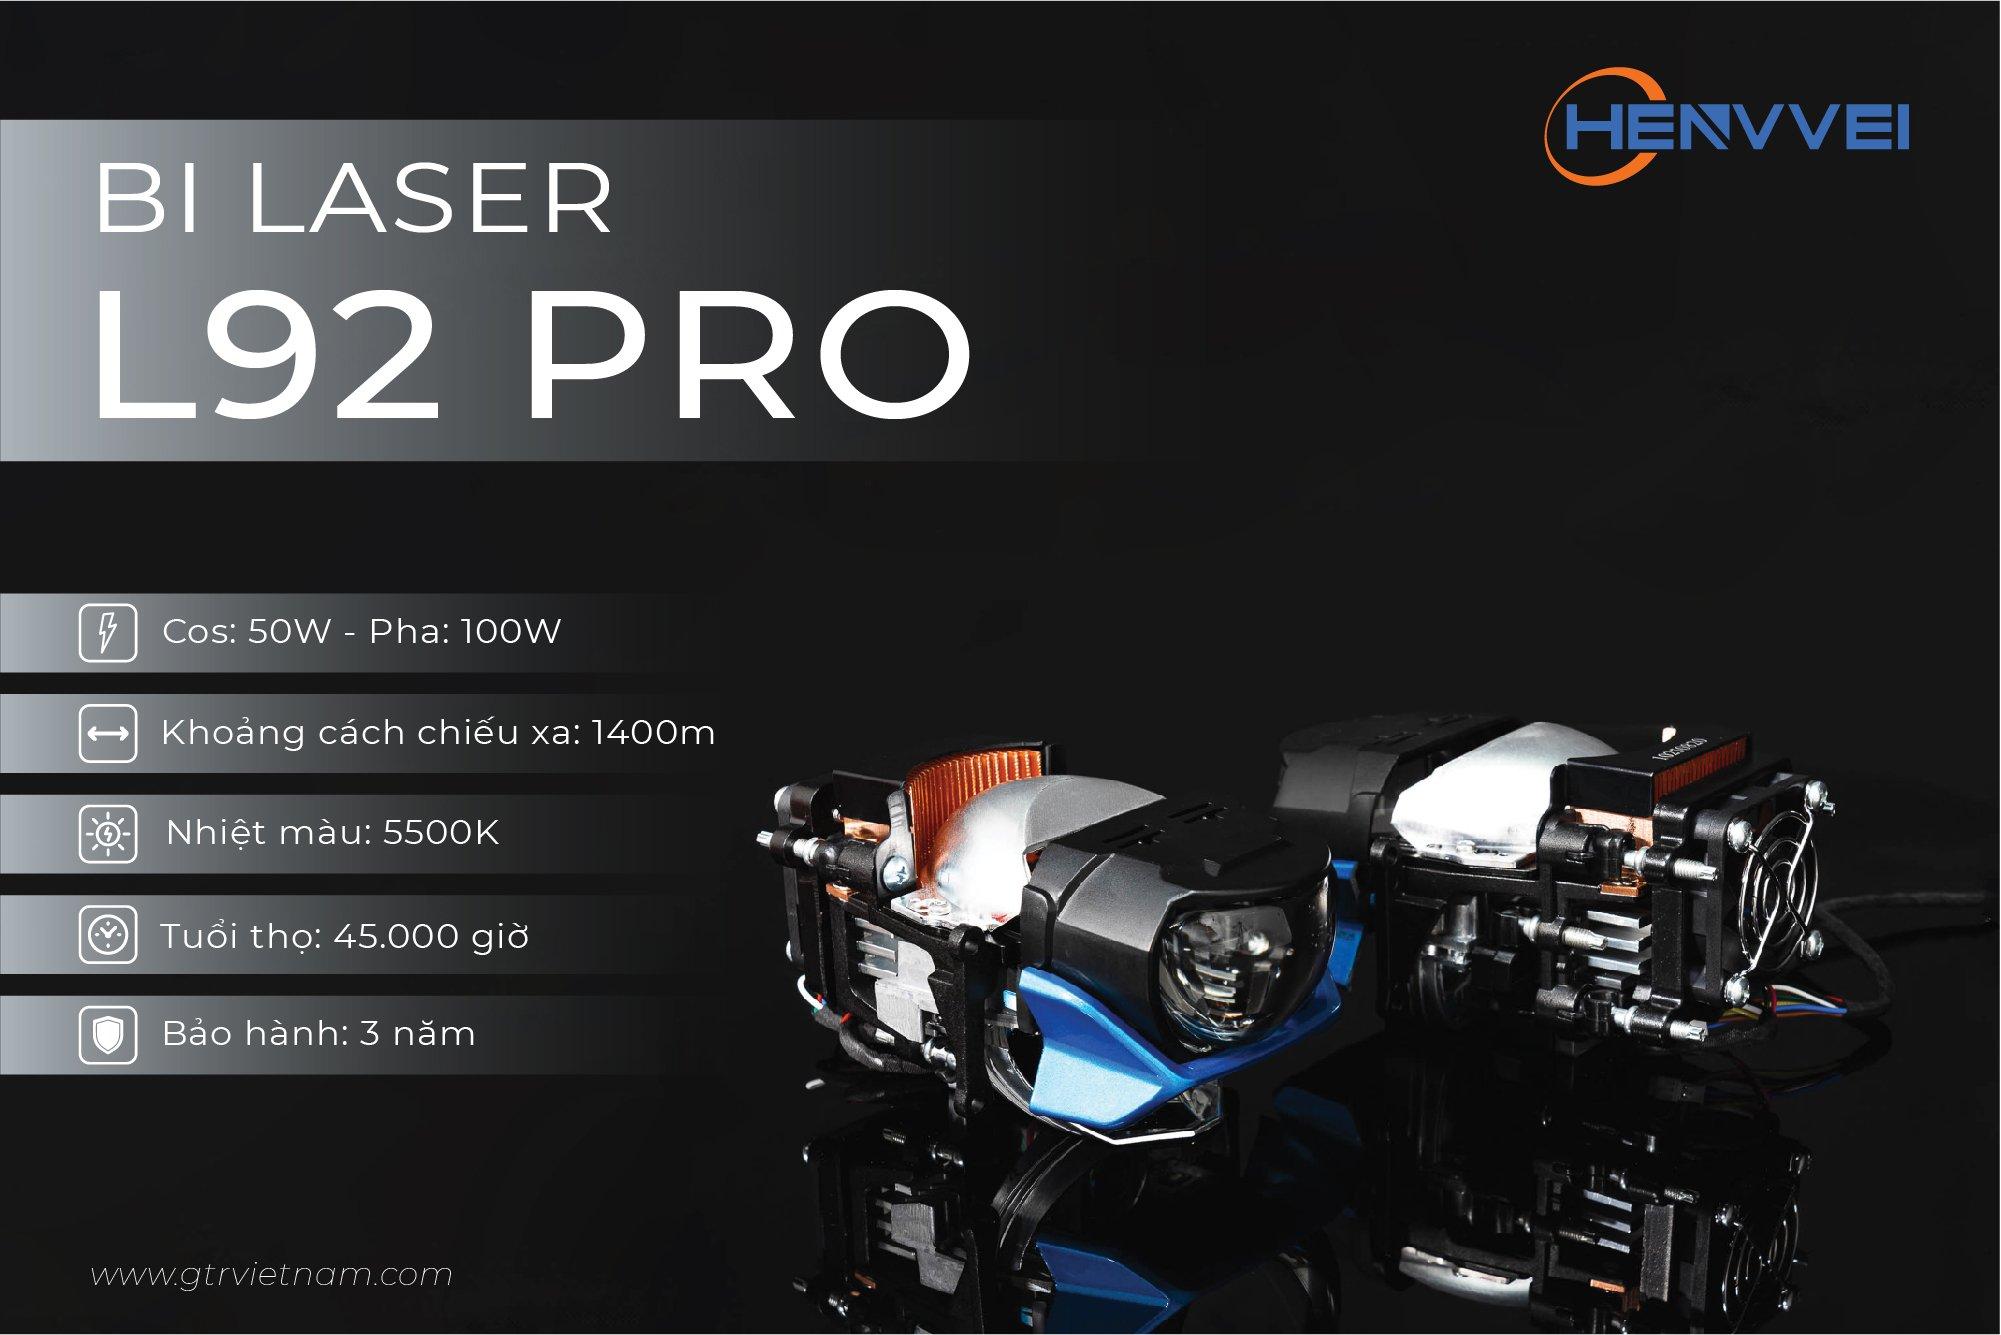 Bi Laser Henvvei L92 Pro